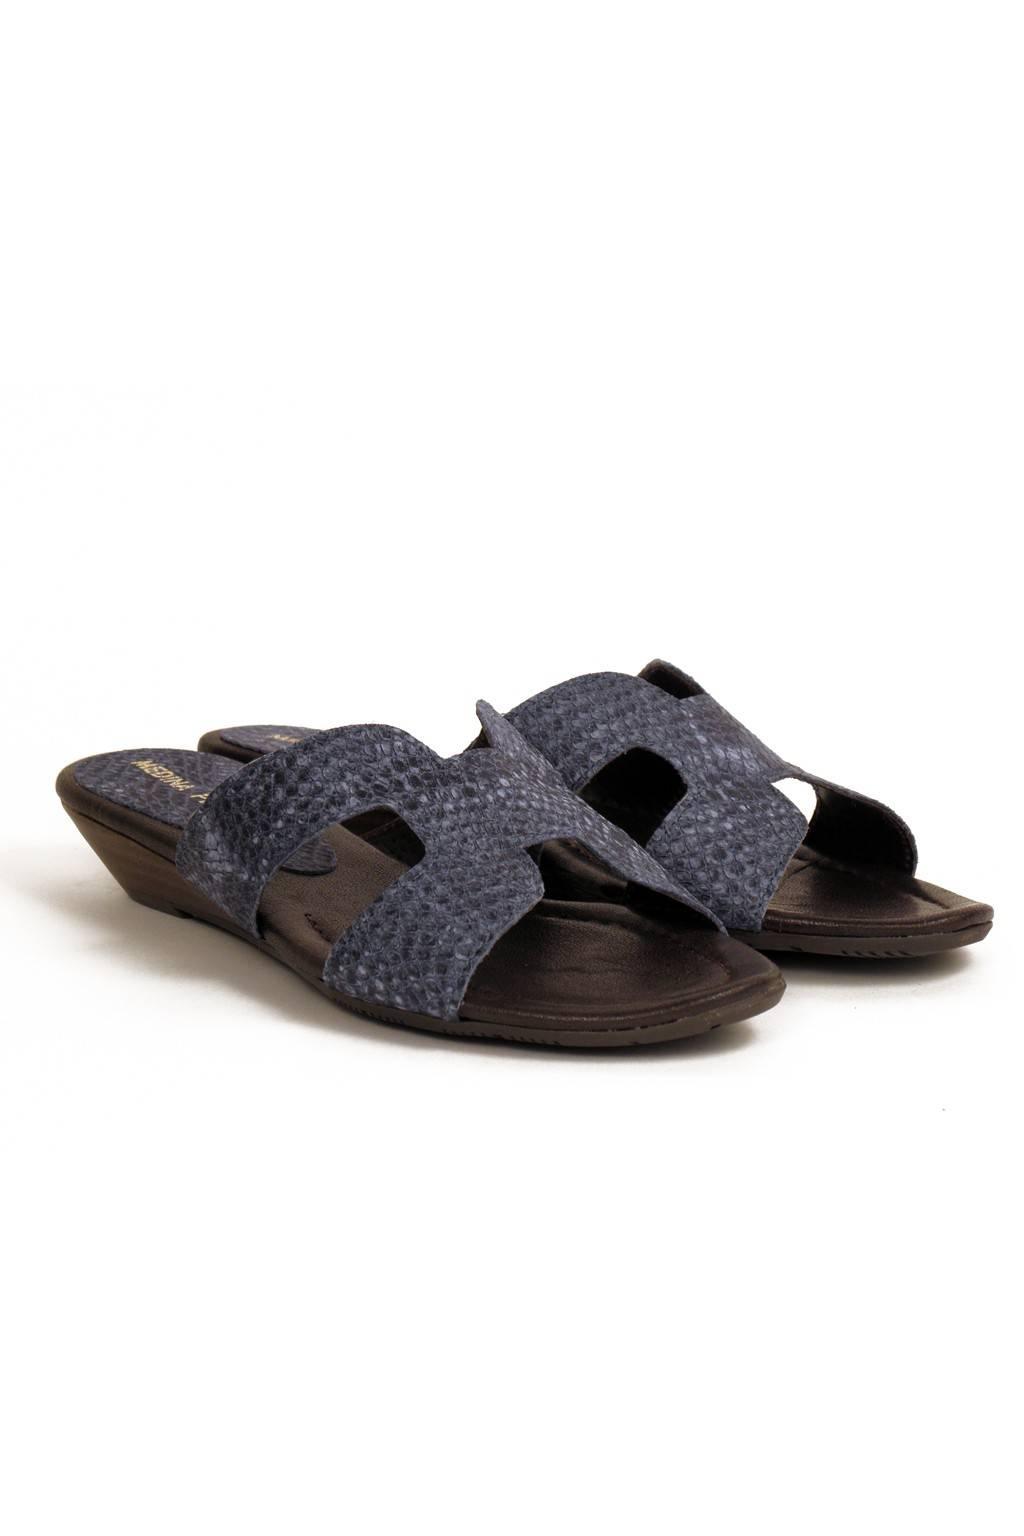 Sandalia piel trenzada